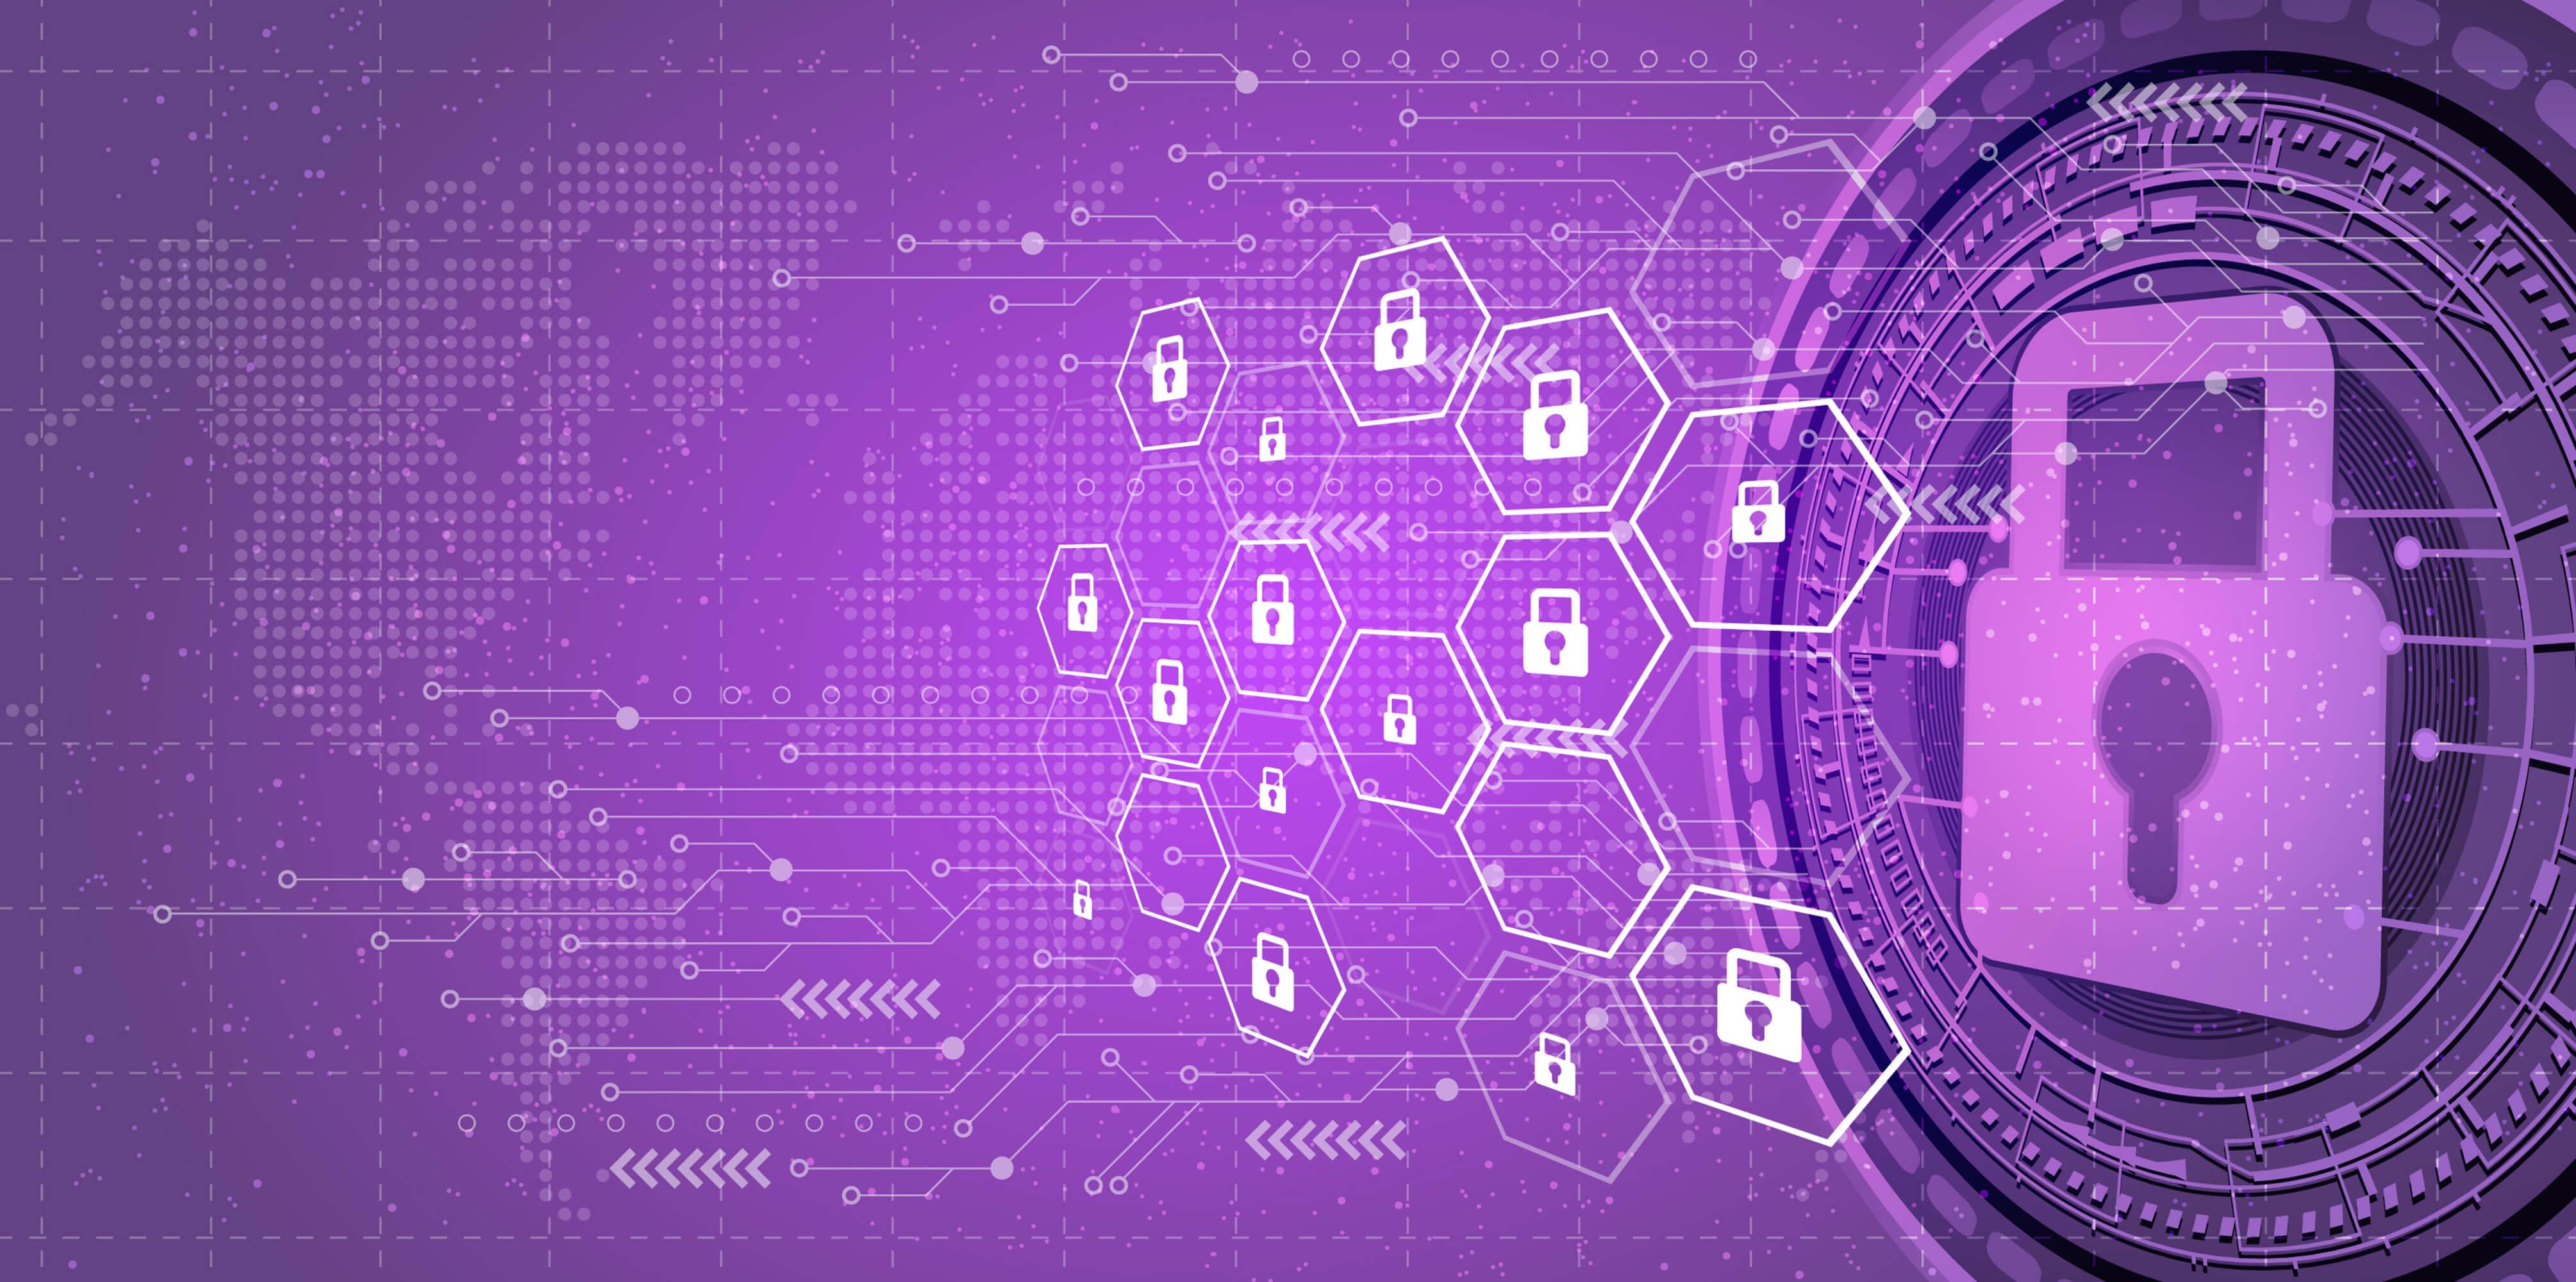 Marco-de-seguridad-cibernética